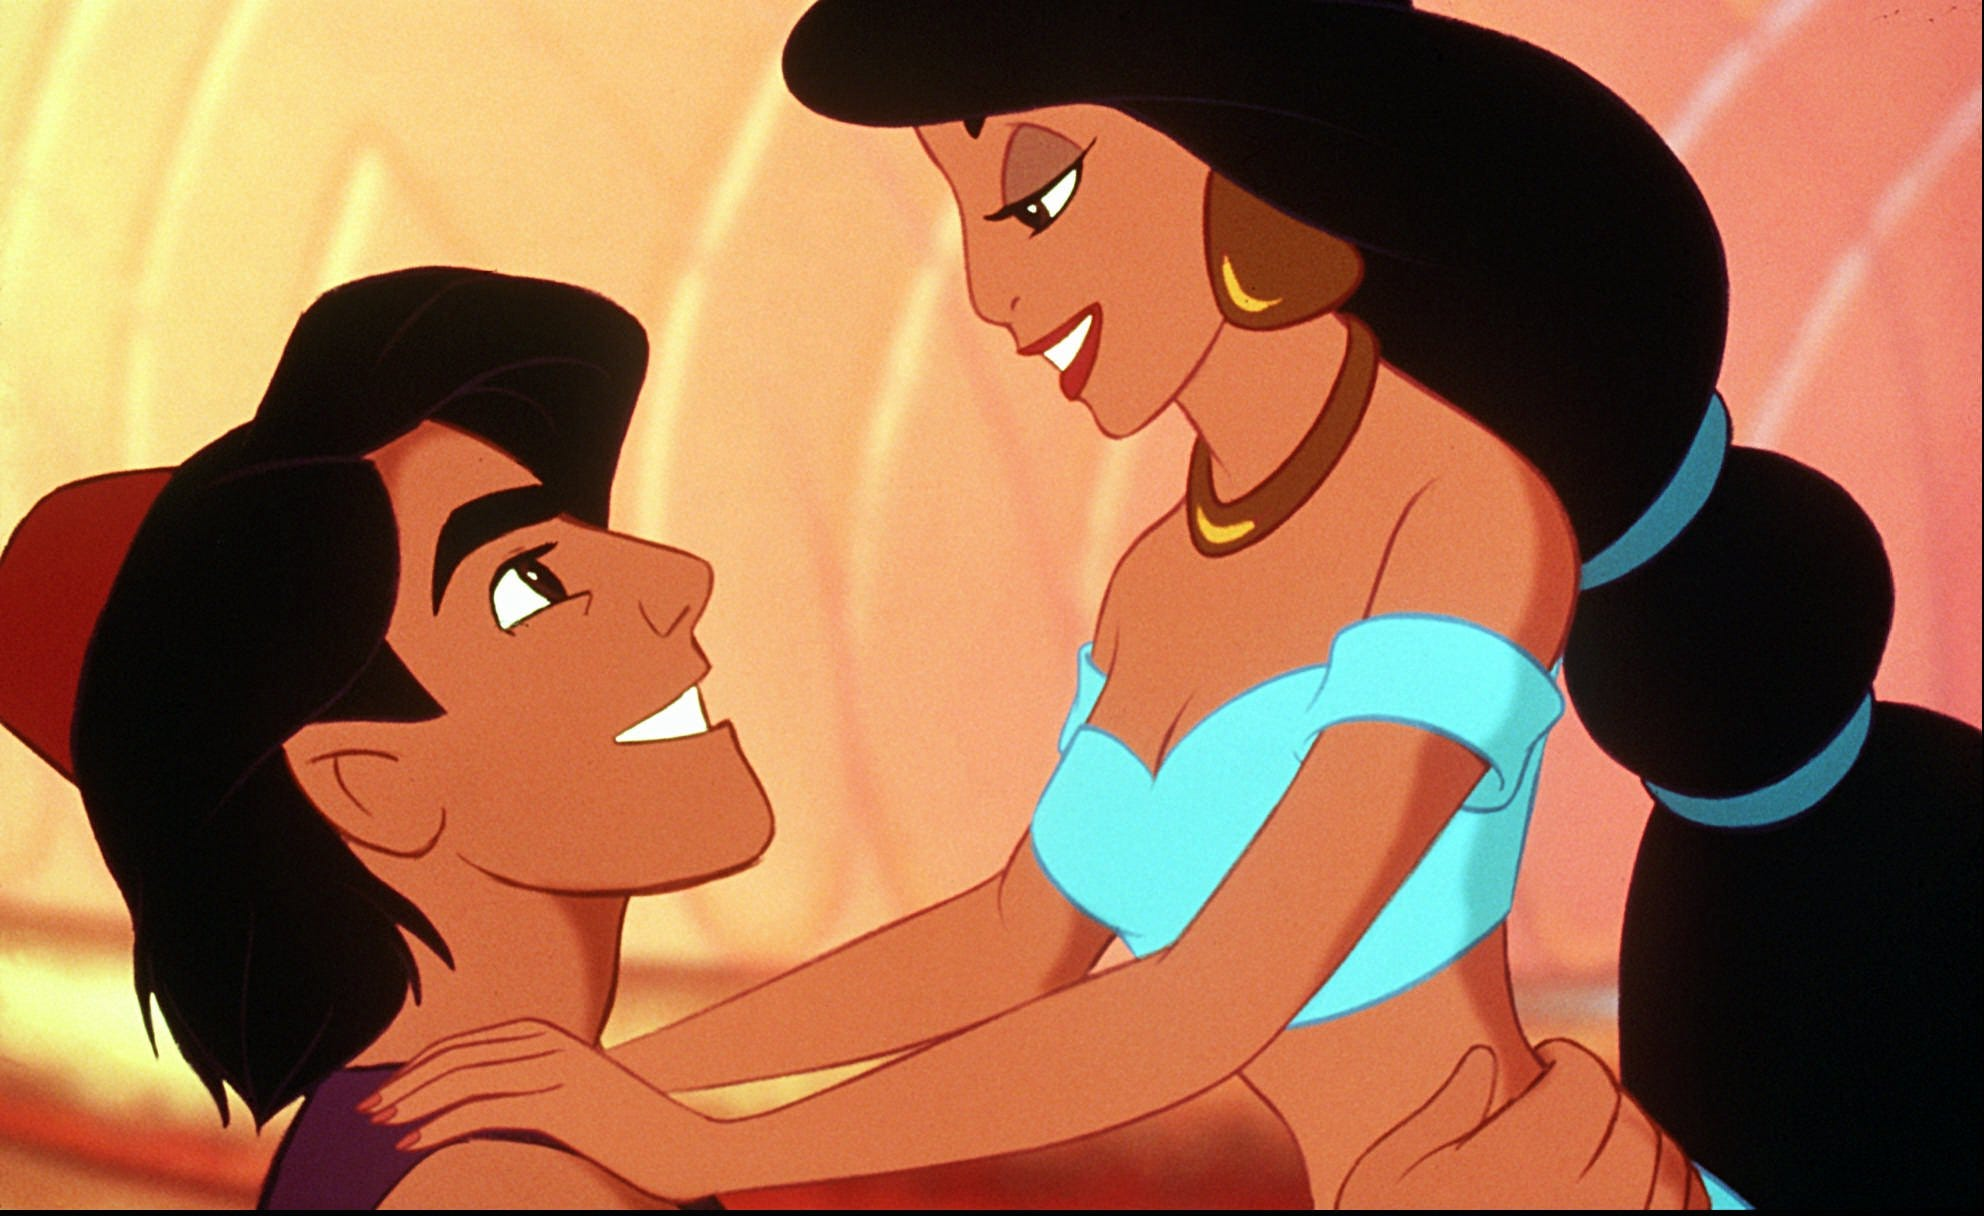 Princess jasmine with short hair